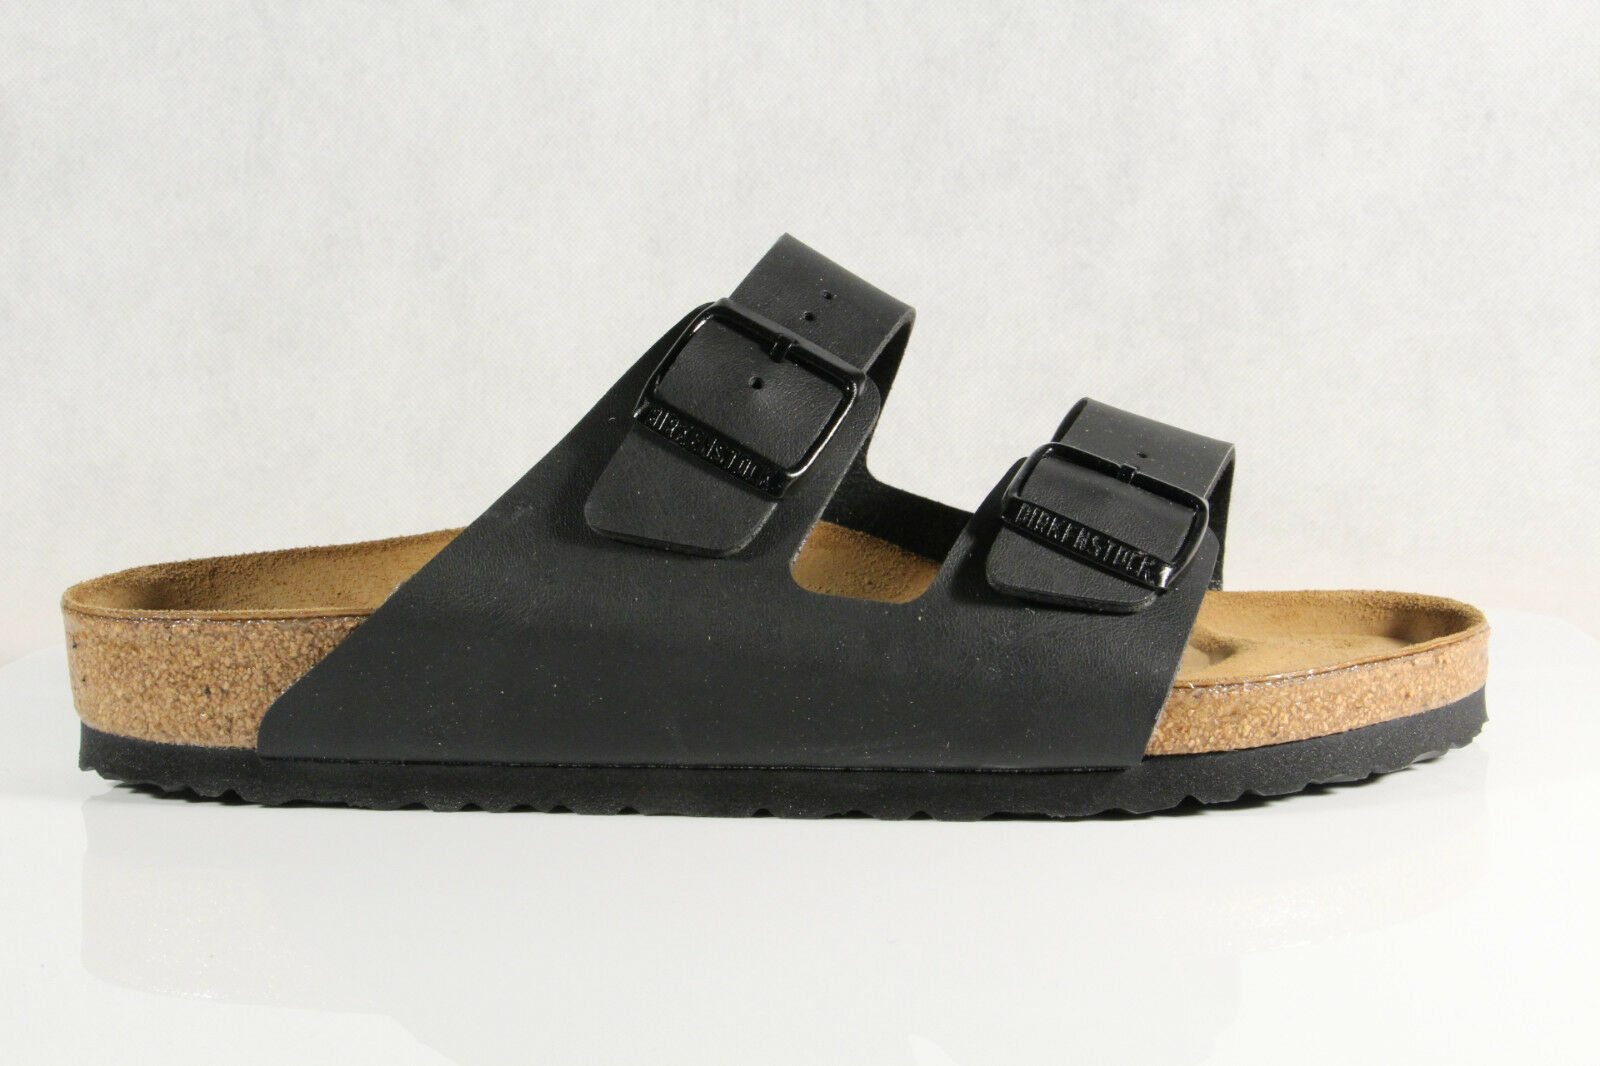 Birkenstock Pantolette Hauschuhe Pantoletten Pantoffel Hauschuhe Pantolette schwarz 051791 NEU 9c1e47